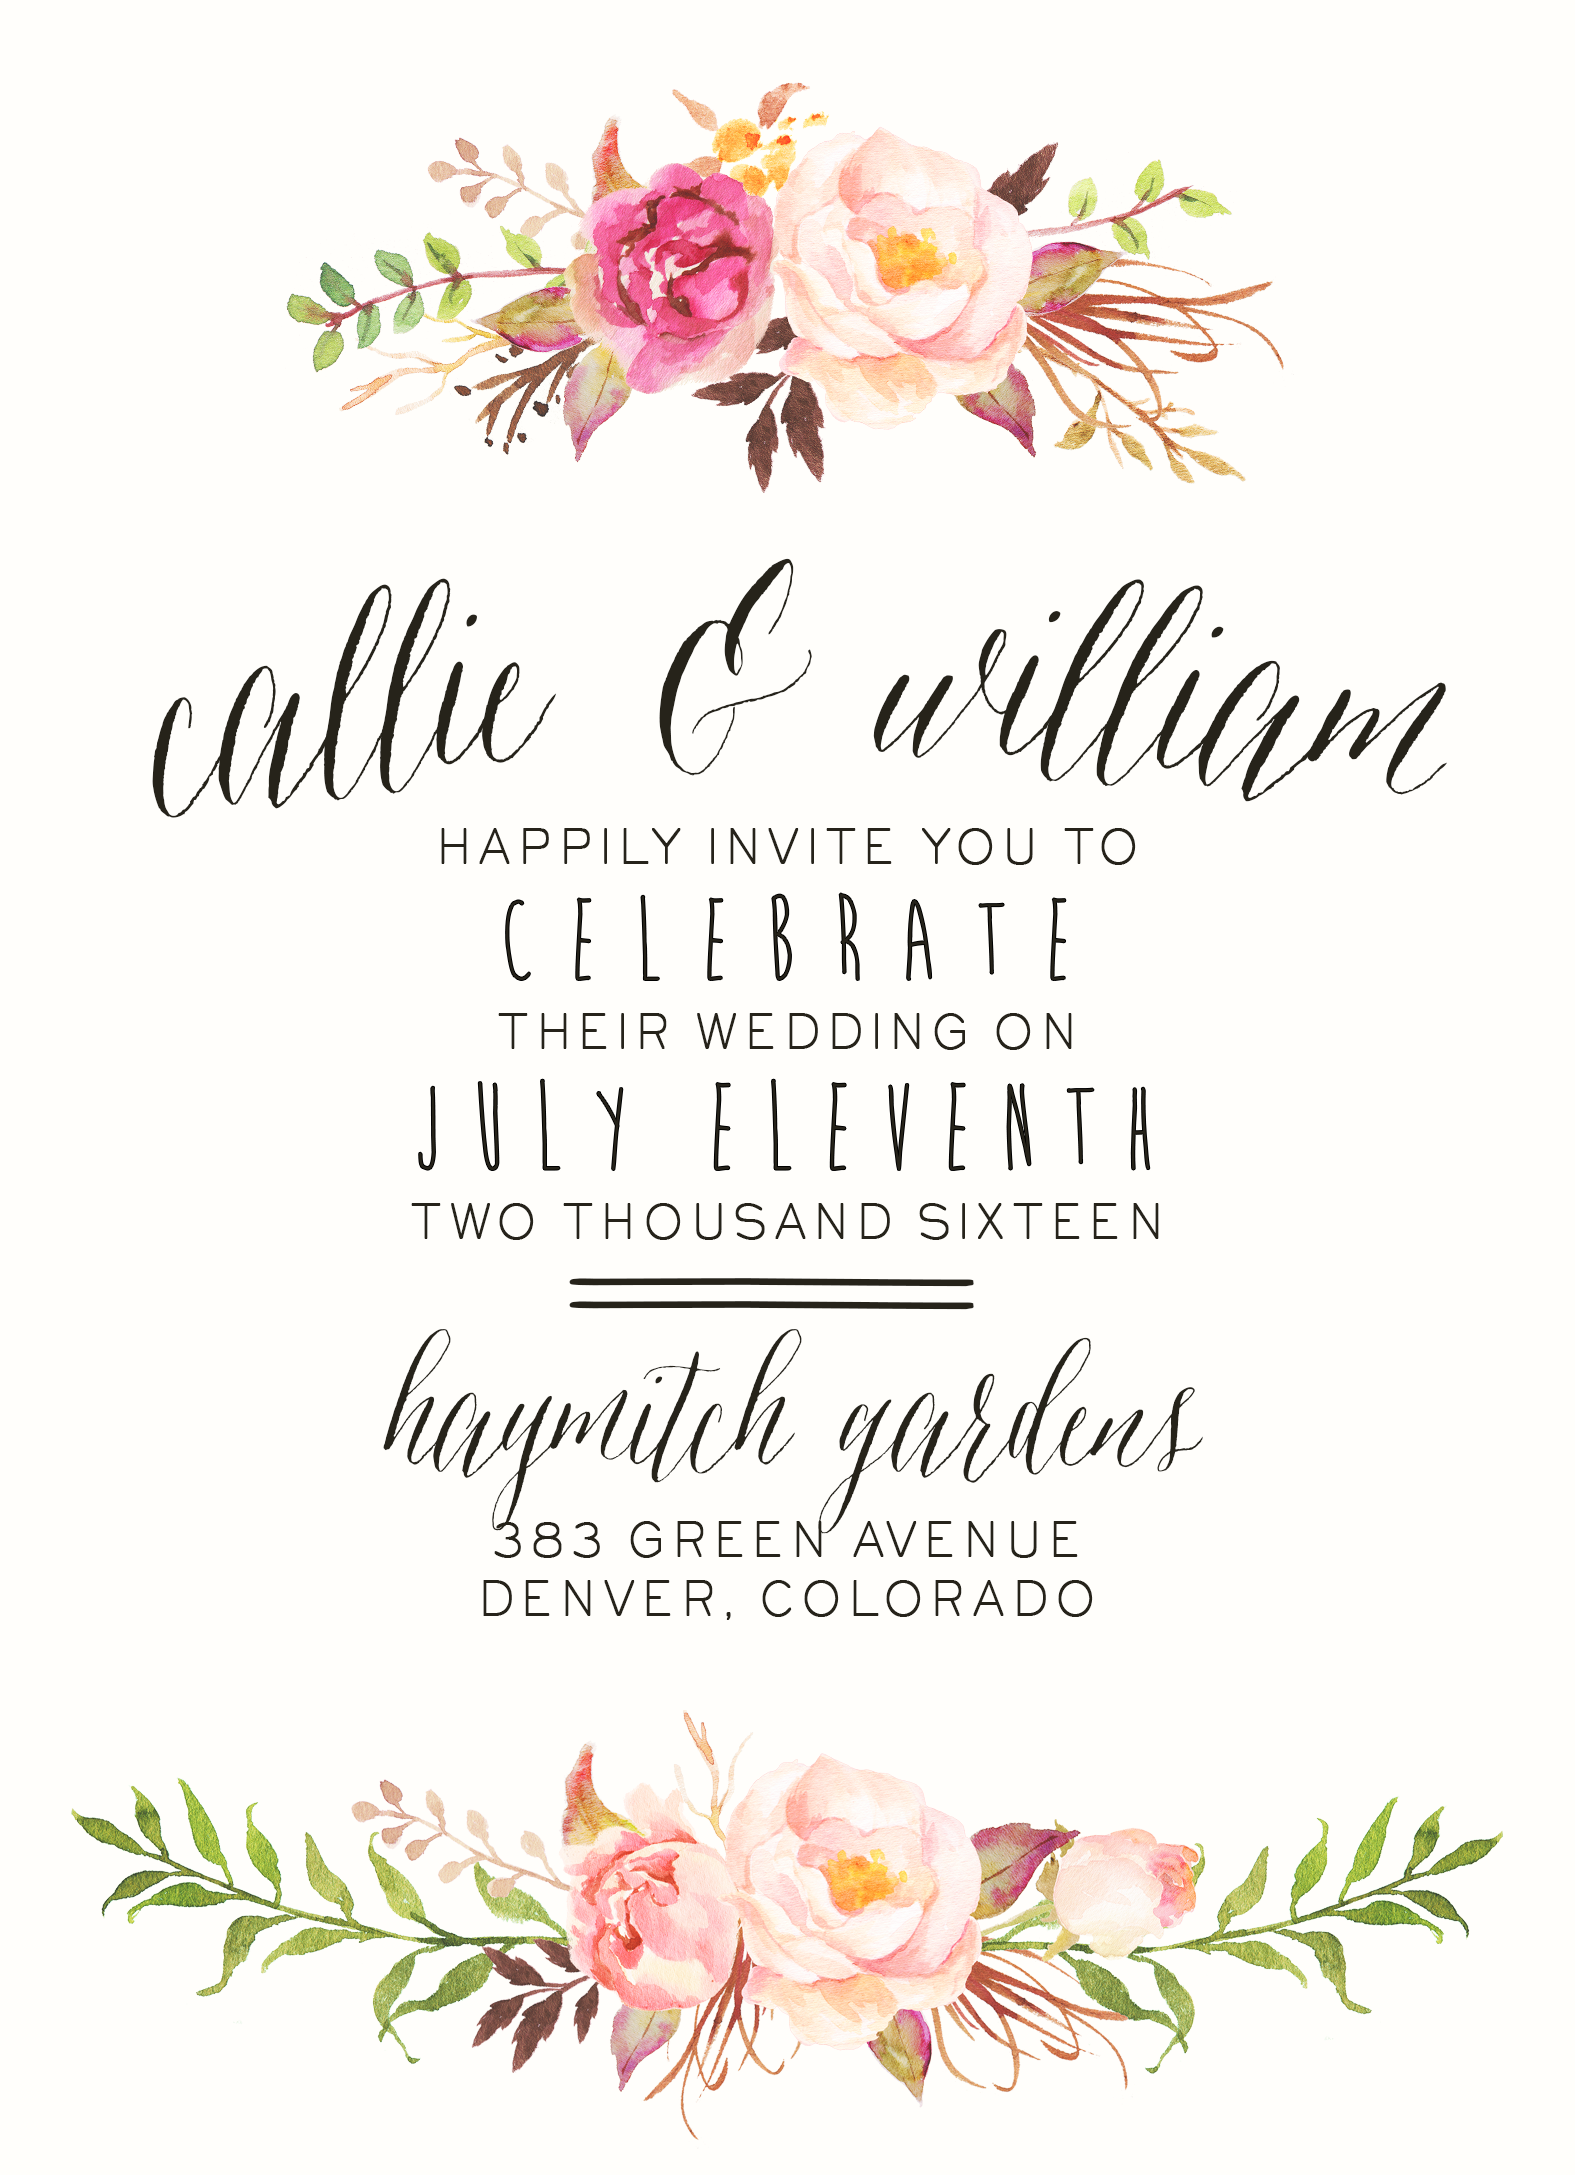 Watercolor Floral Wedding Invitation by SplashOfSilver // R